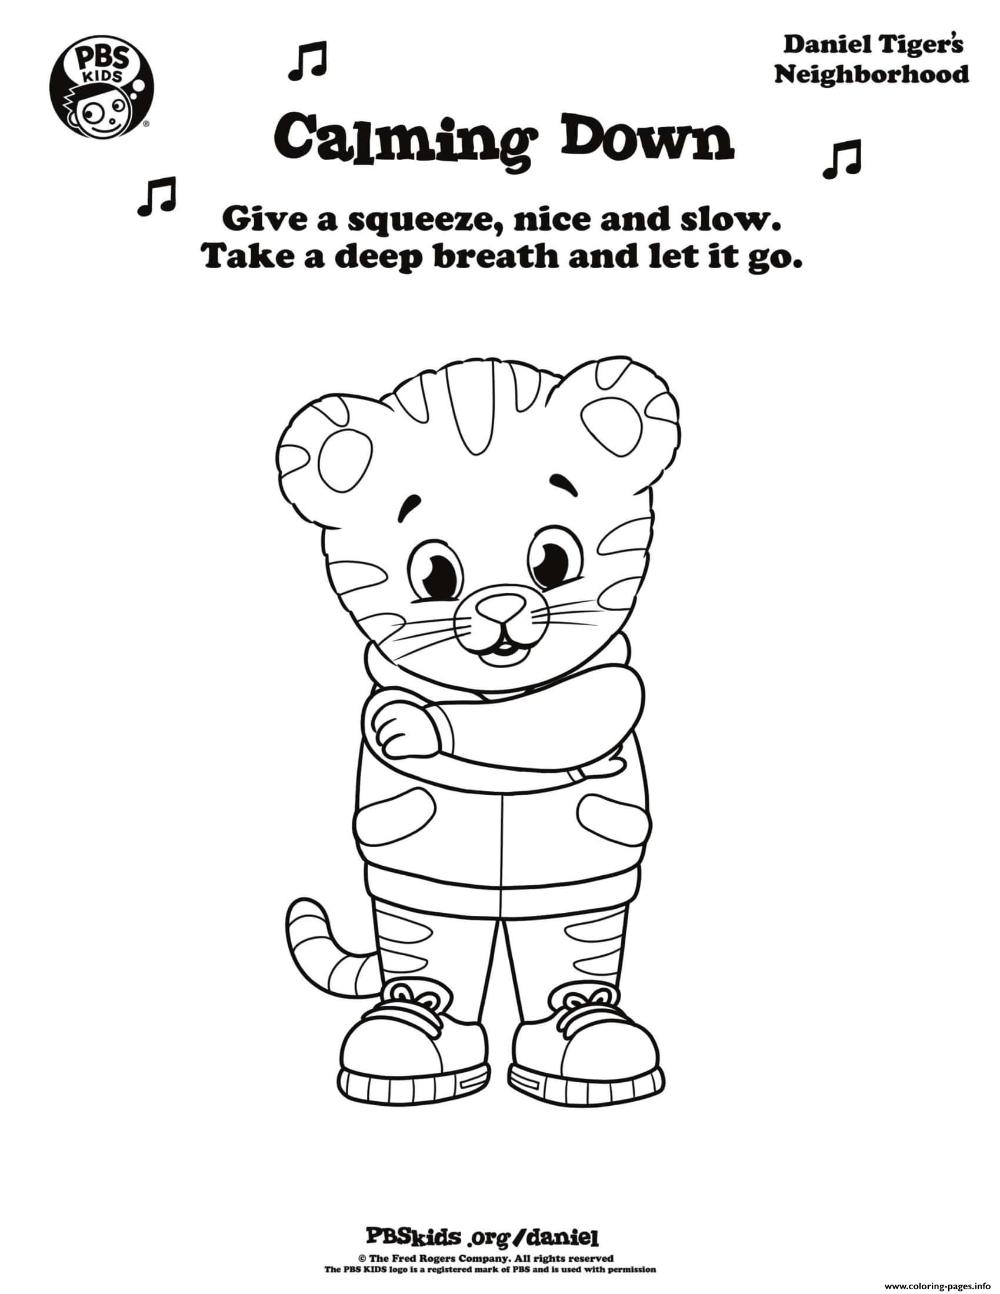 Print Calming Down Daniel Tiger Min Coloring Pages Daniel Tiger Coloring Pages Halloween Coloring Pages